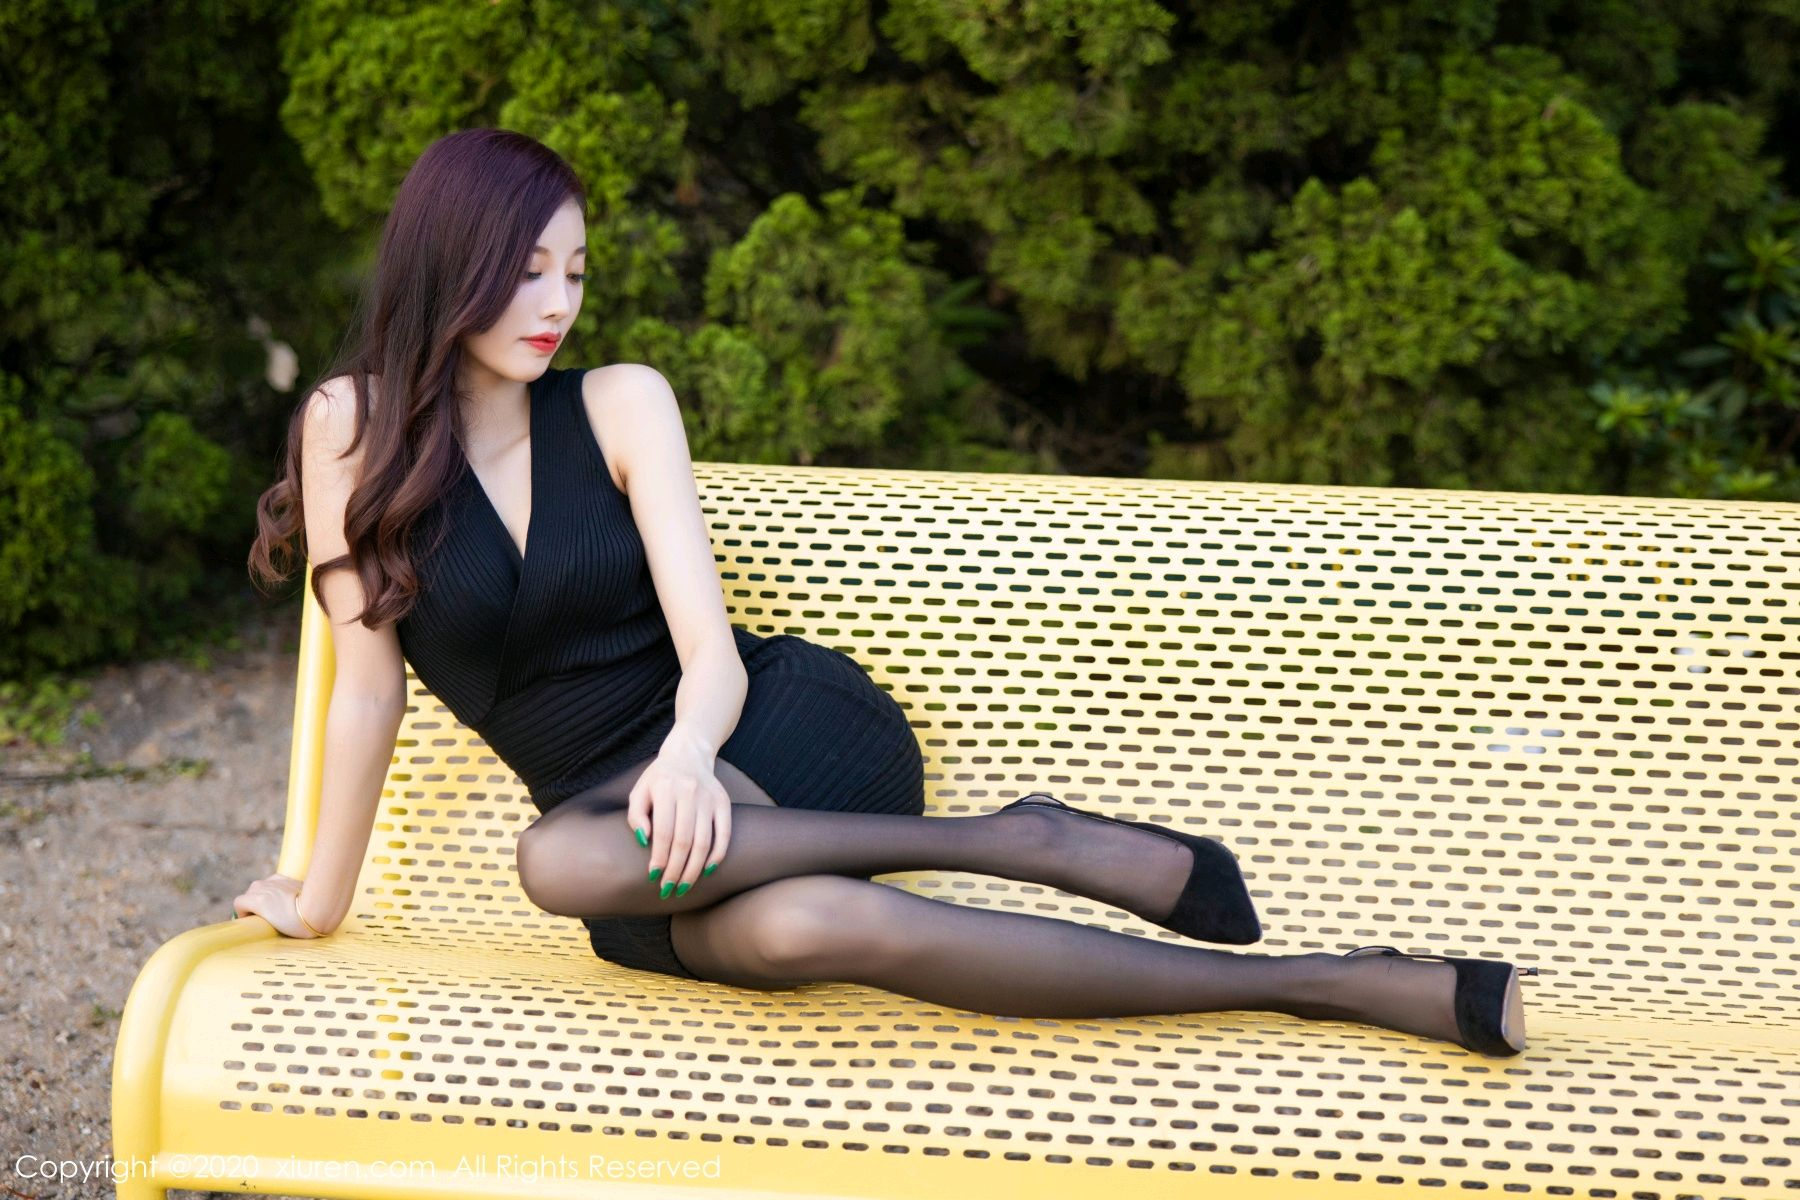 [XiuRen] Vol.2648 Yang Chen Chen 56P, Black Silk, Outdoor, Xiuren, Yang Chen Chen